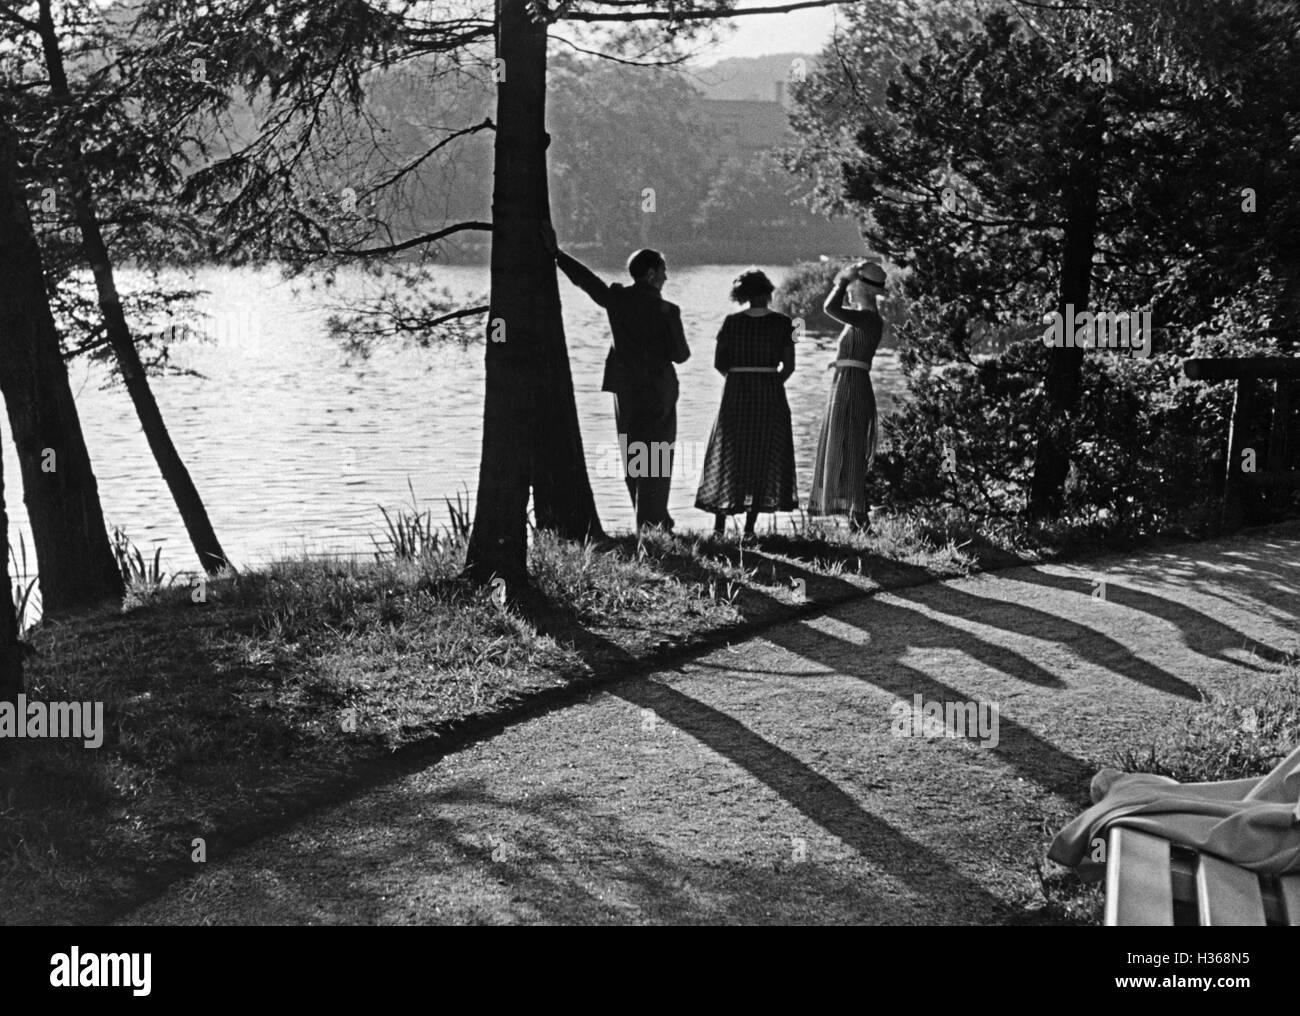 Lake view, 1936 - Stock Image